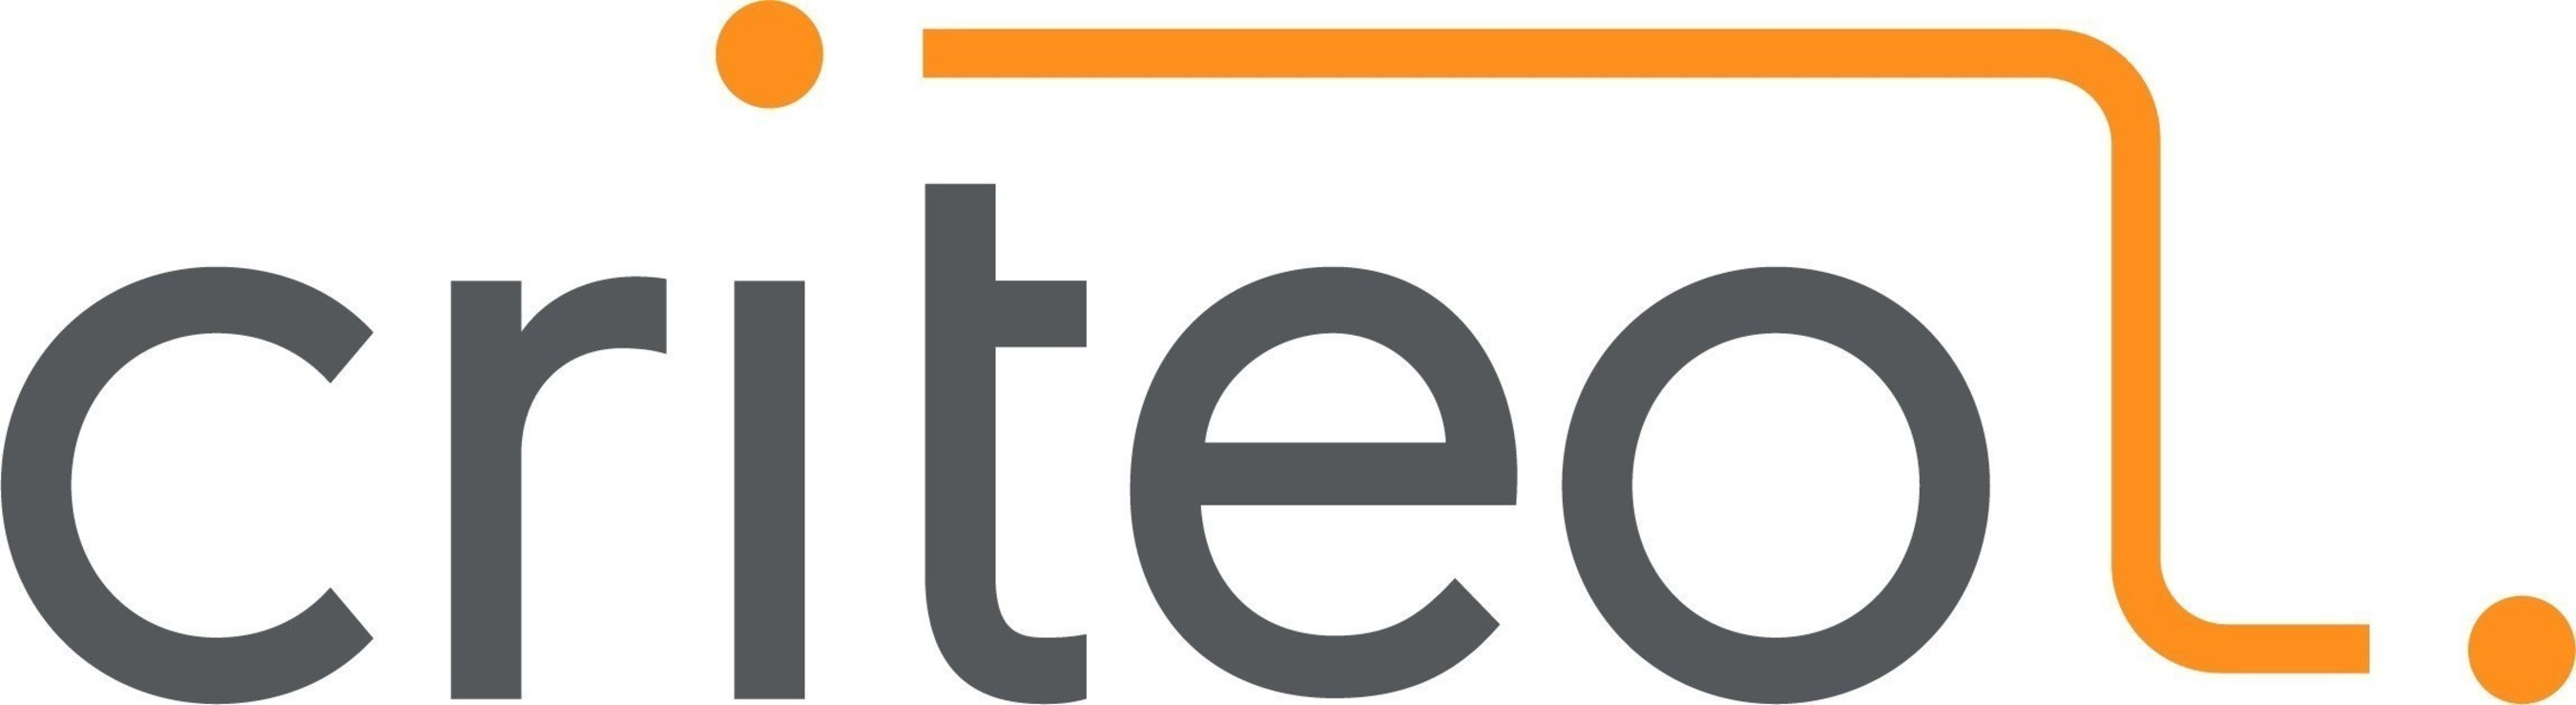 Criteo's Litigation Against Steelhouse